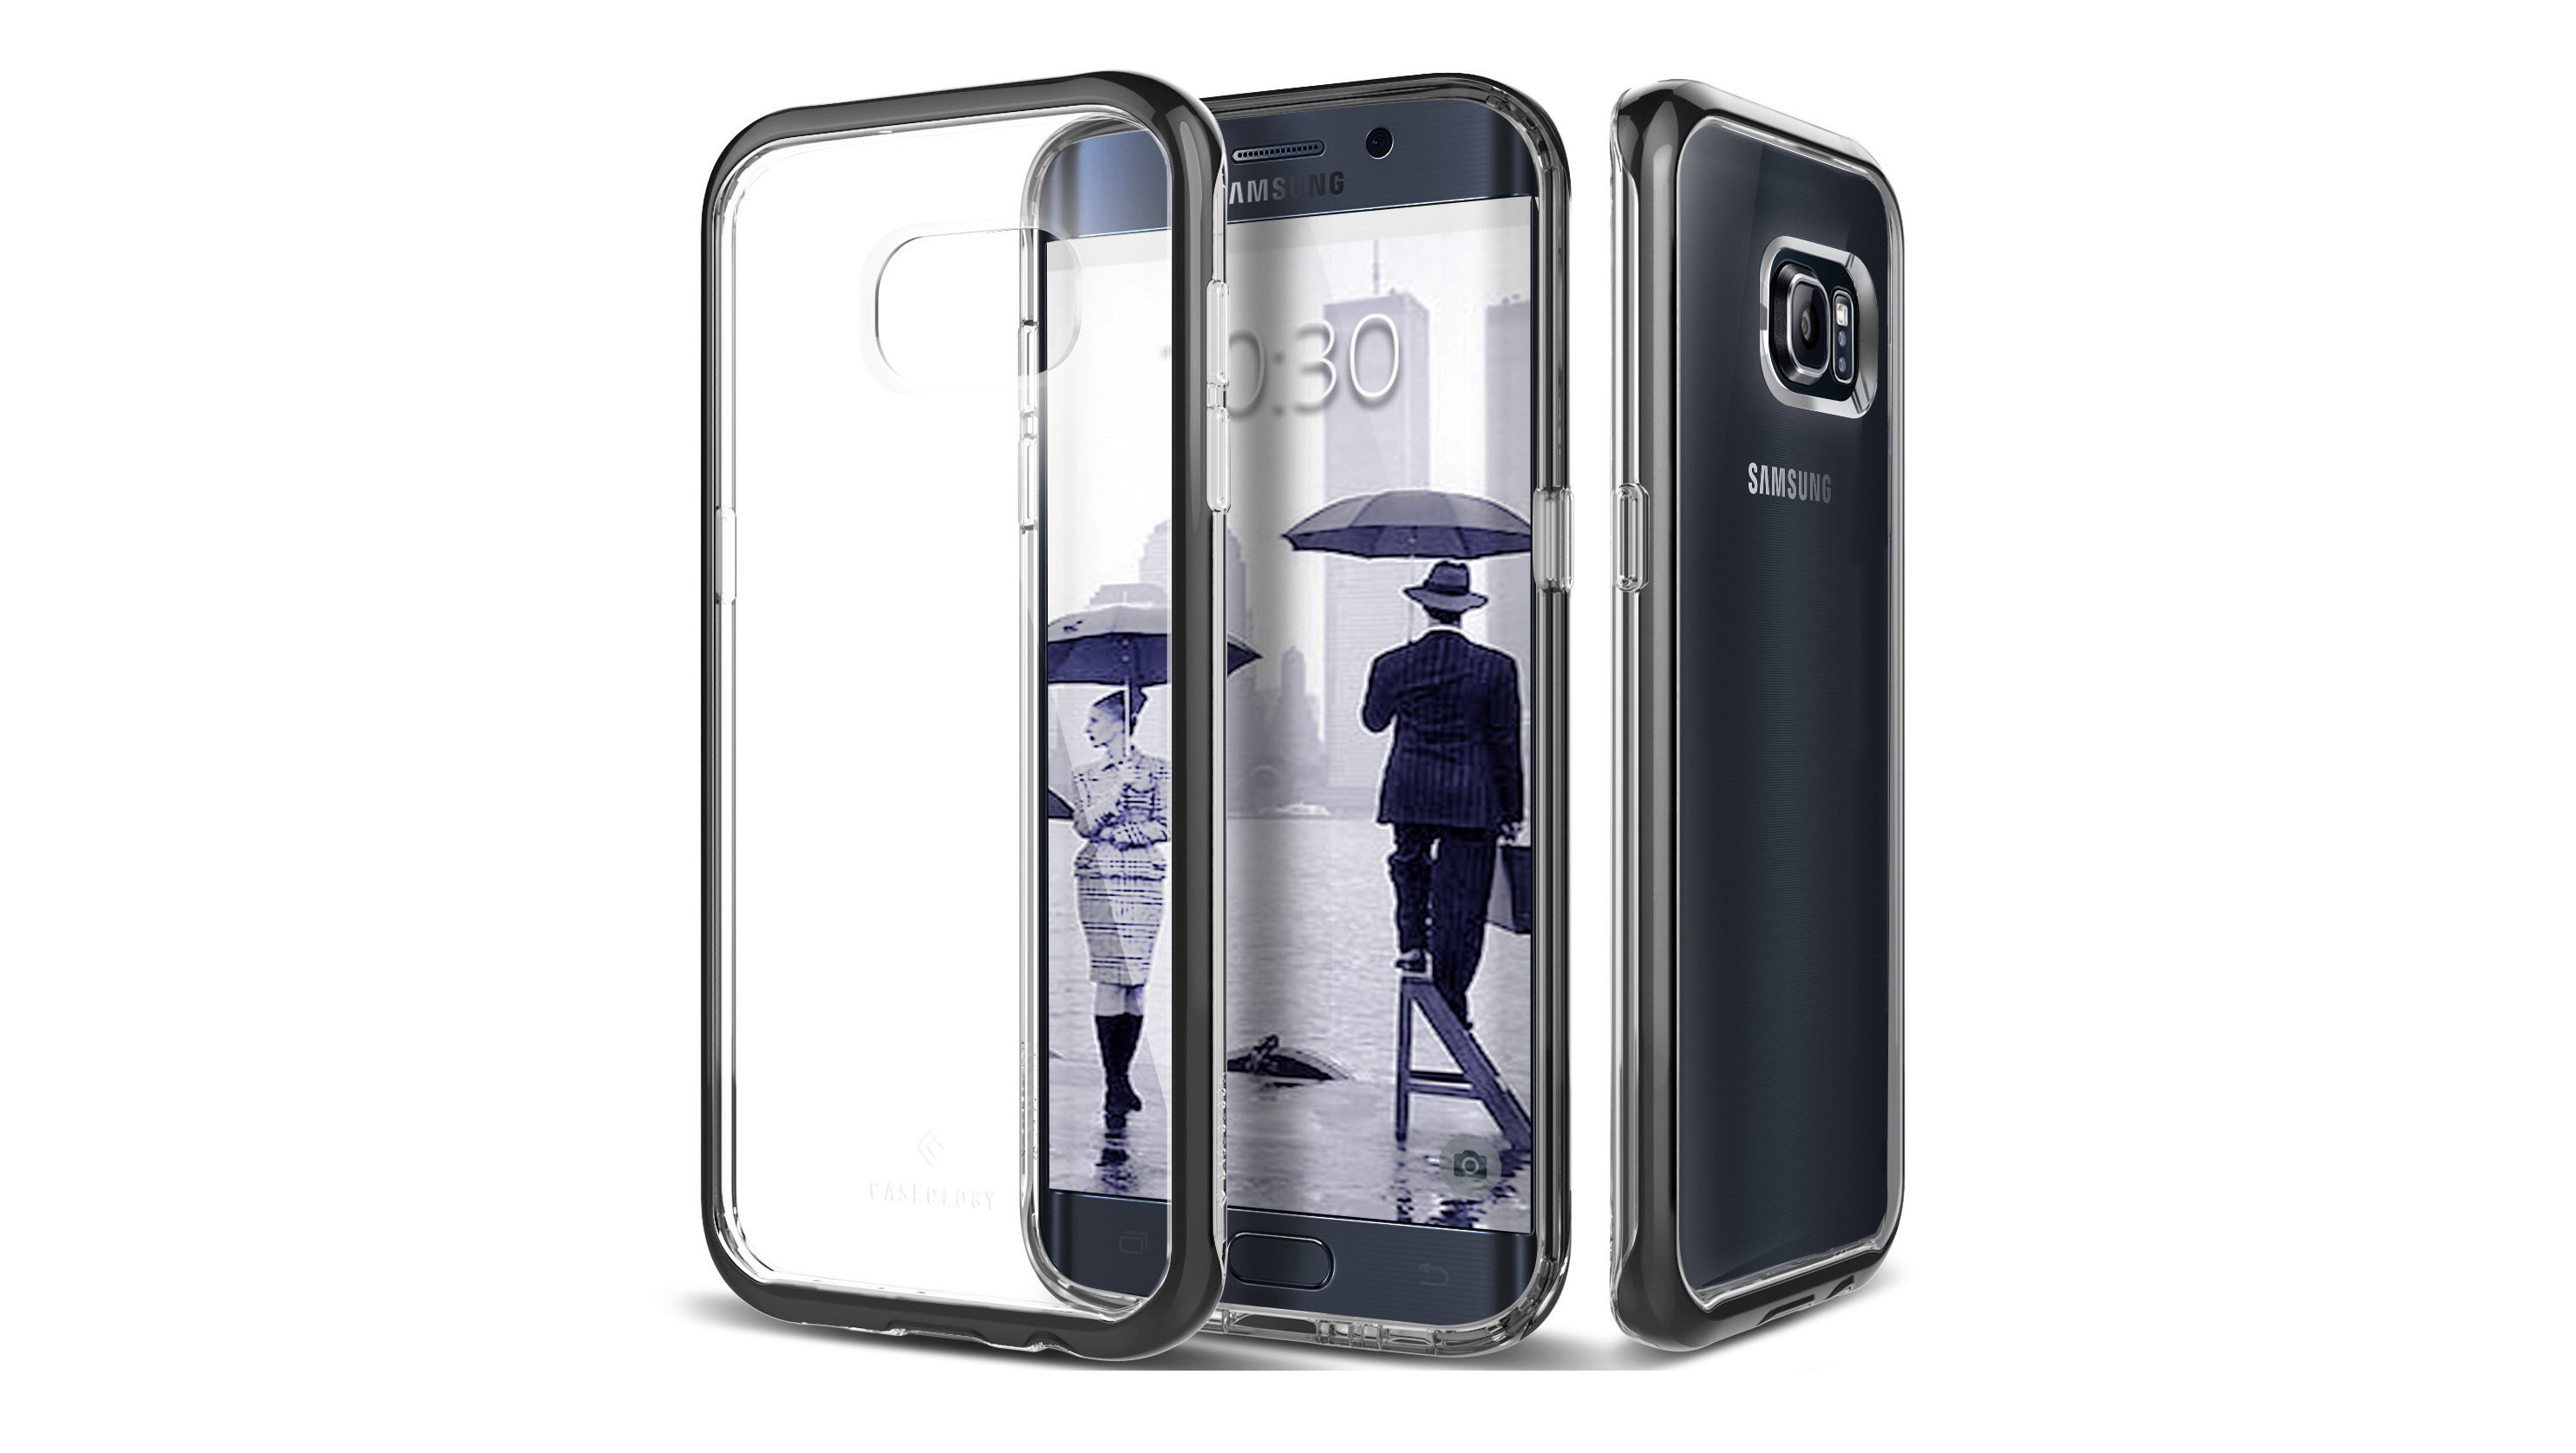 Samsung Galaxy S7 Edge Cases, Samsung Galaxy S7 Edge Case, Galaxy S7 Edge Cases, Galaxy S7 Edge Case, best Samsung Galaxy S7 Edge Cases, best Samsung Galaxy S7 Edge Case, S7 Edge Cases, best S7 Edge Cases, S7 Edge Case, best S7 Edge Case, samsung phone cases, samsung galaxy s7 edge, best phone cases, cool phone cases, cute phone cases